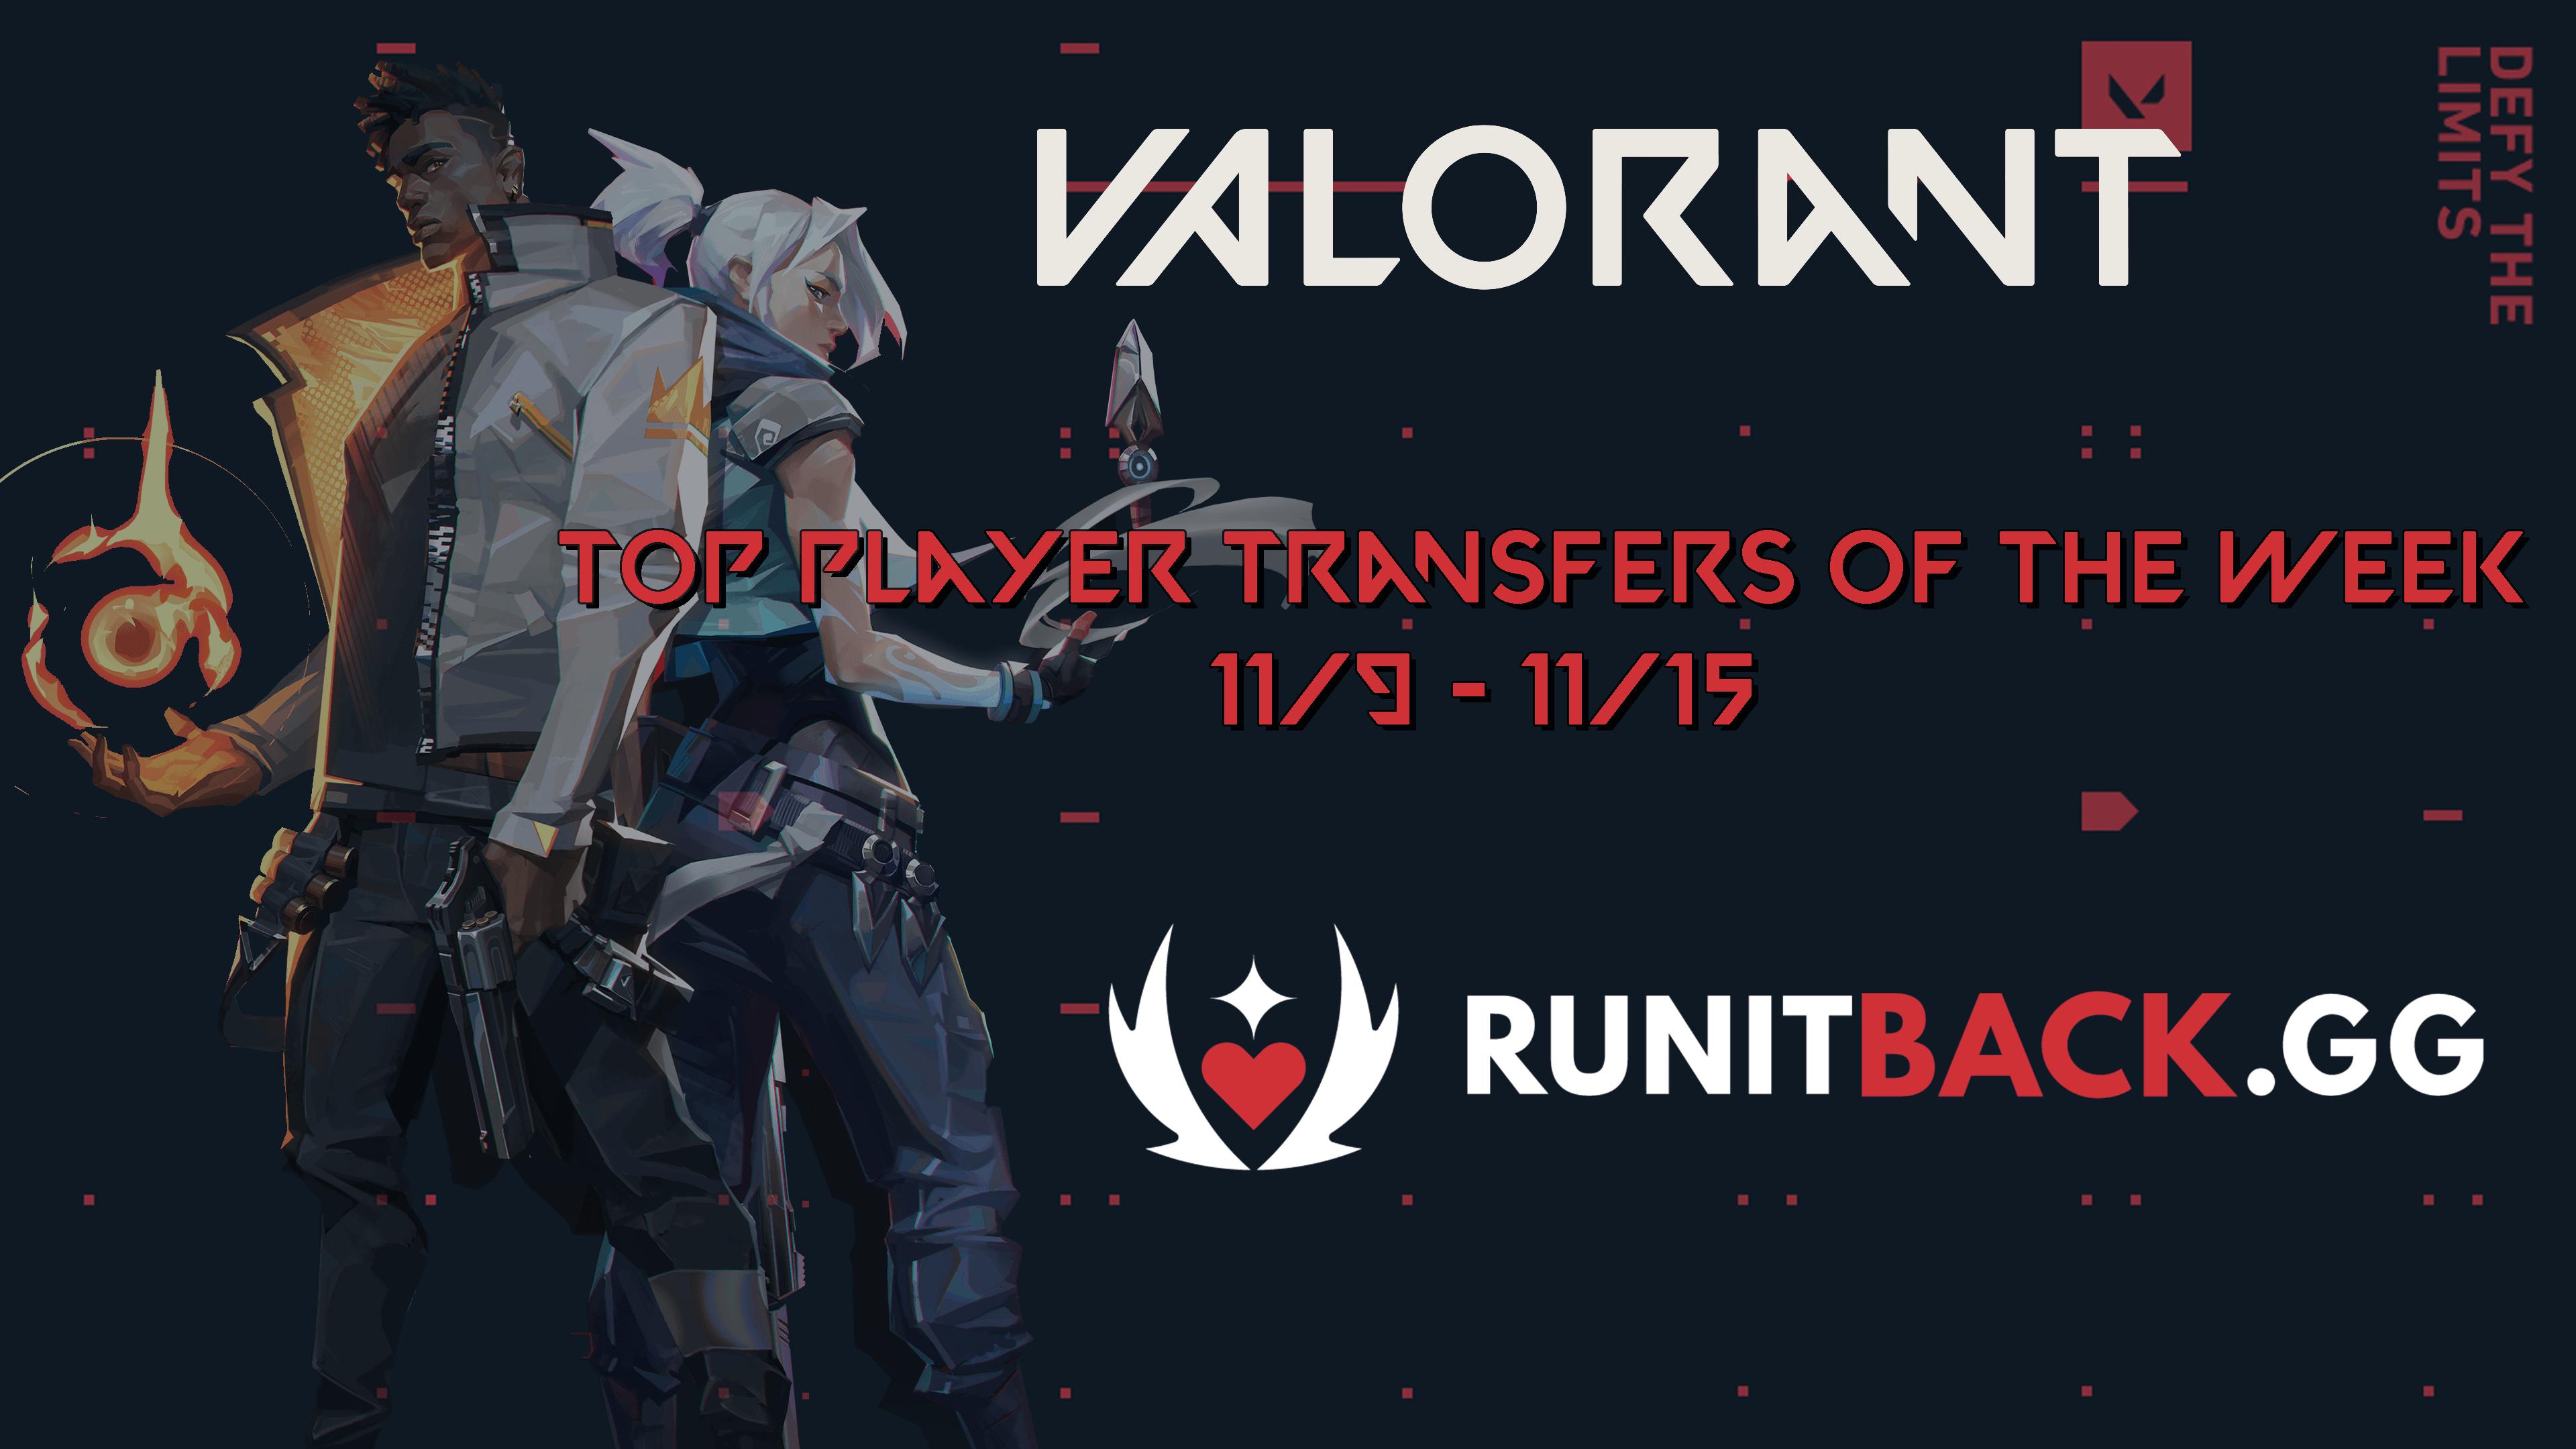 Top Player Transfers of the Week: November 9 – November 15